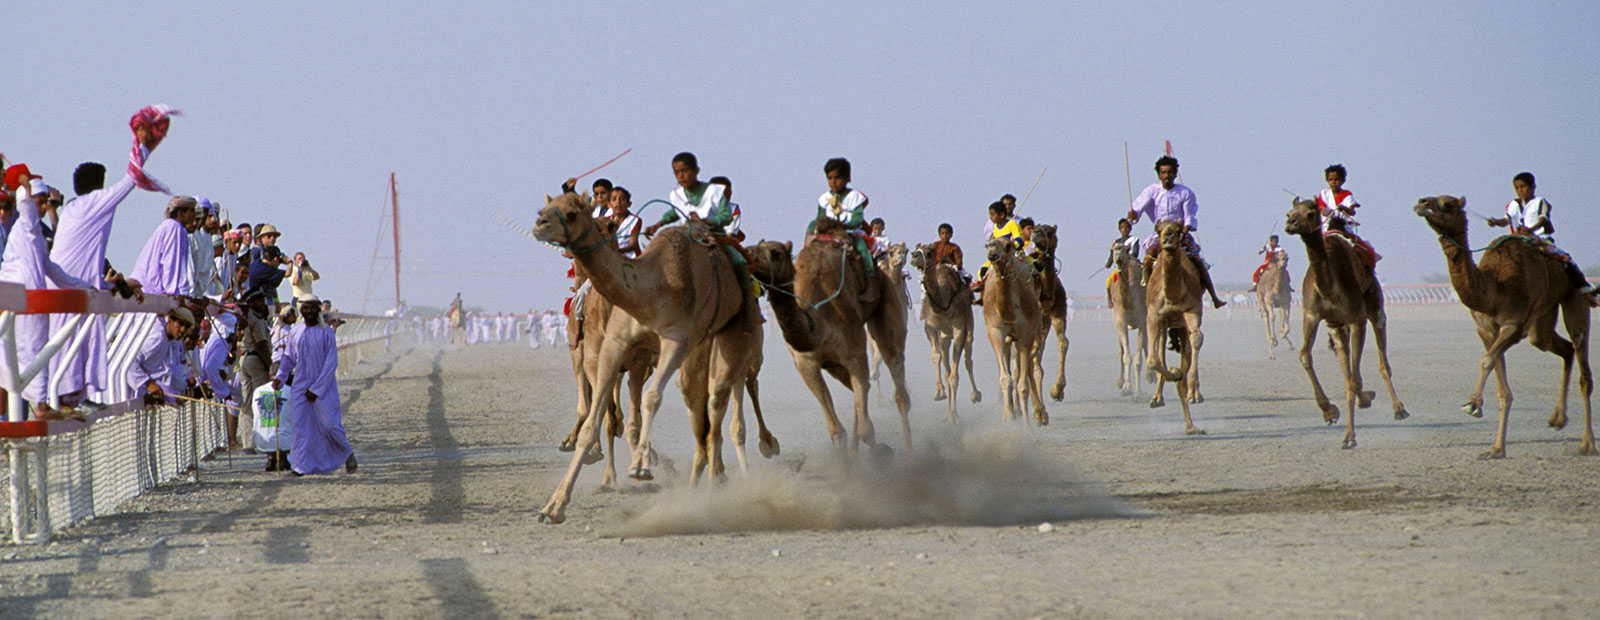 Exklusive Hotels im Oman